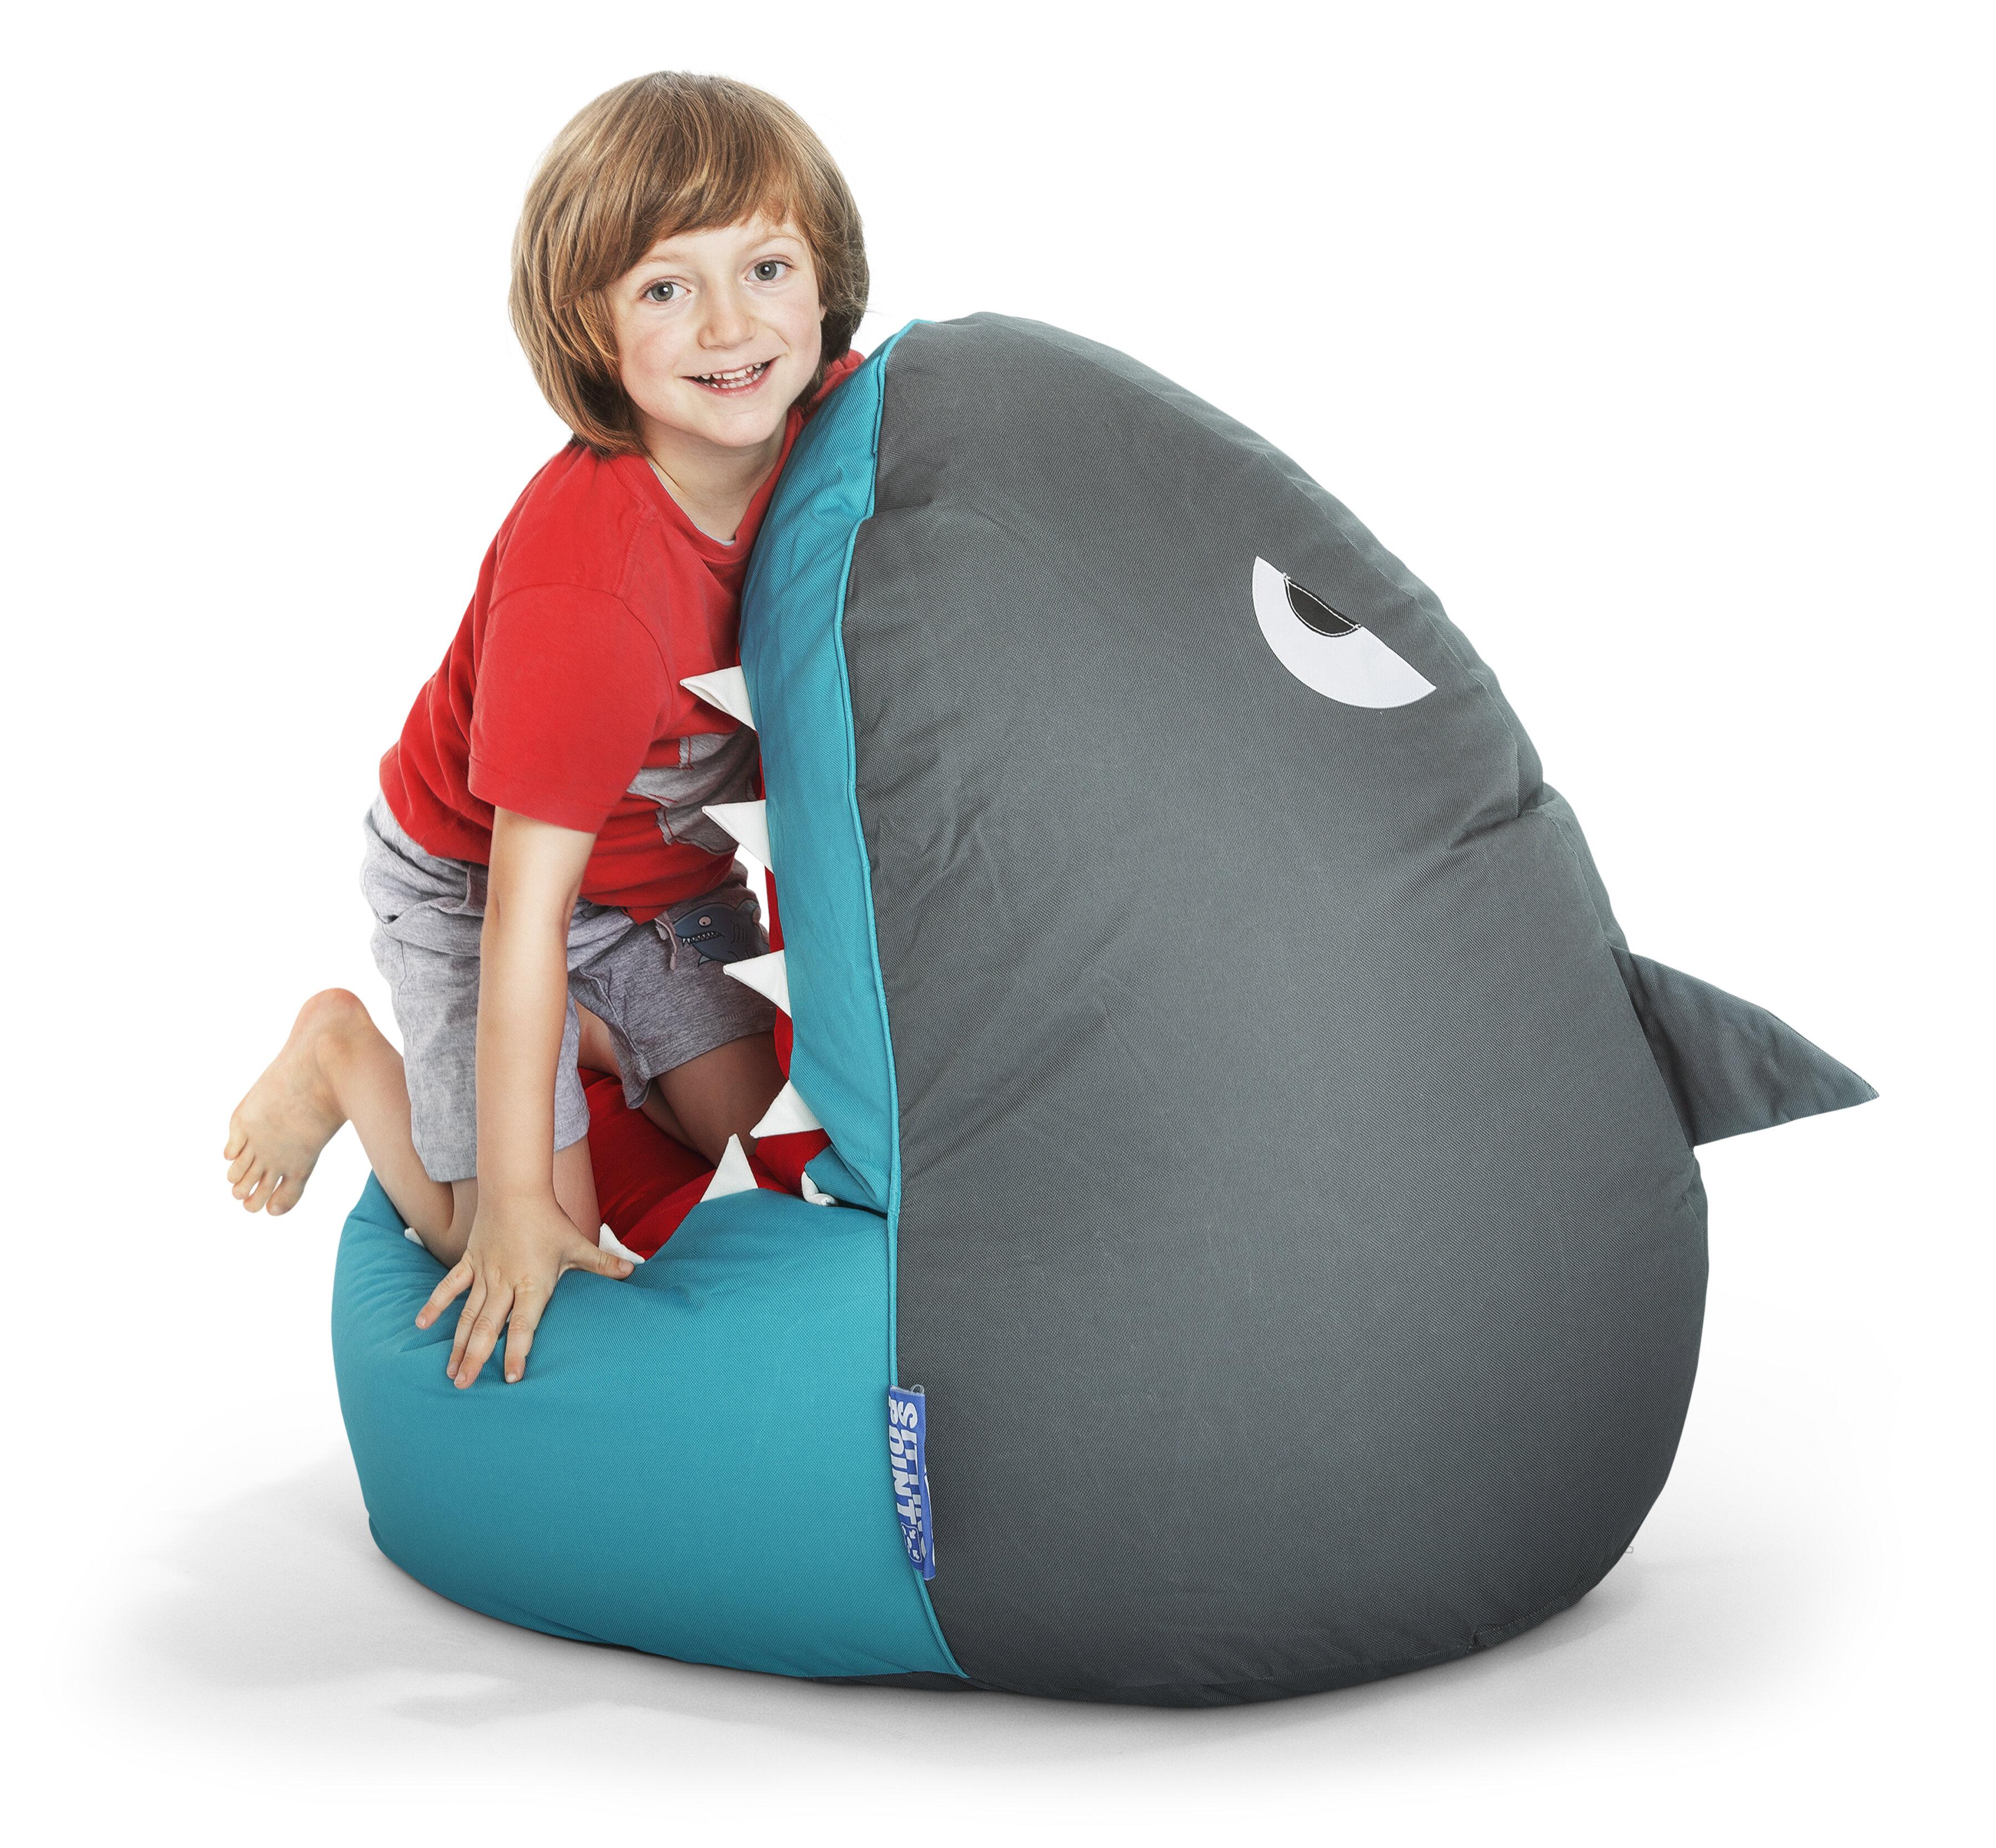 Surprising Shark Large Bean Bag Chair Machost Co Dining Chair Design Ideas Machostcouk